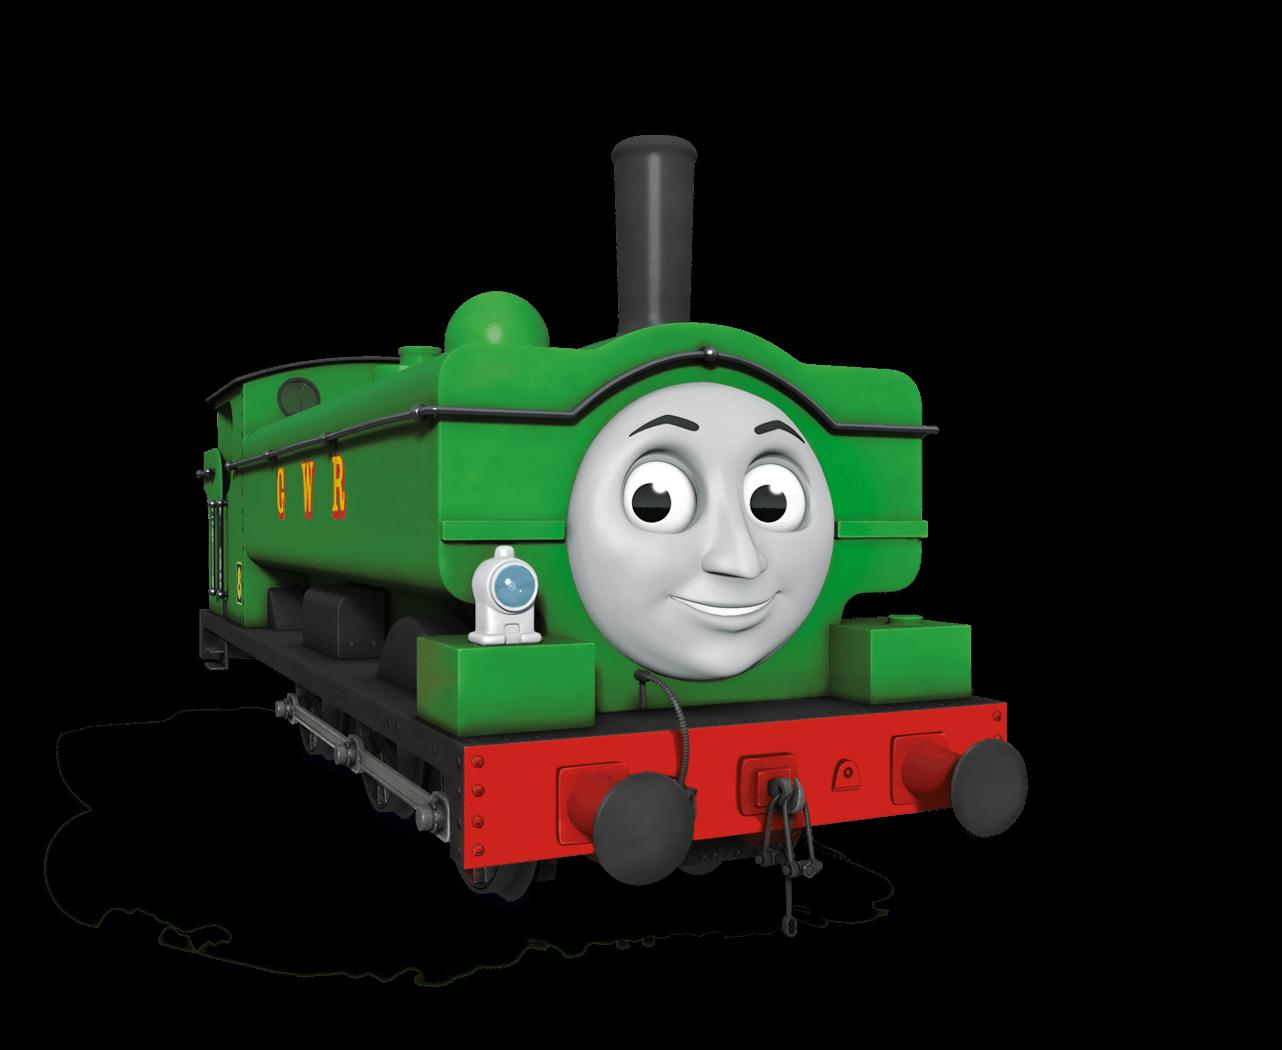 Wheel clipart thomas train. Percy character profile bio